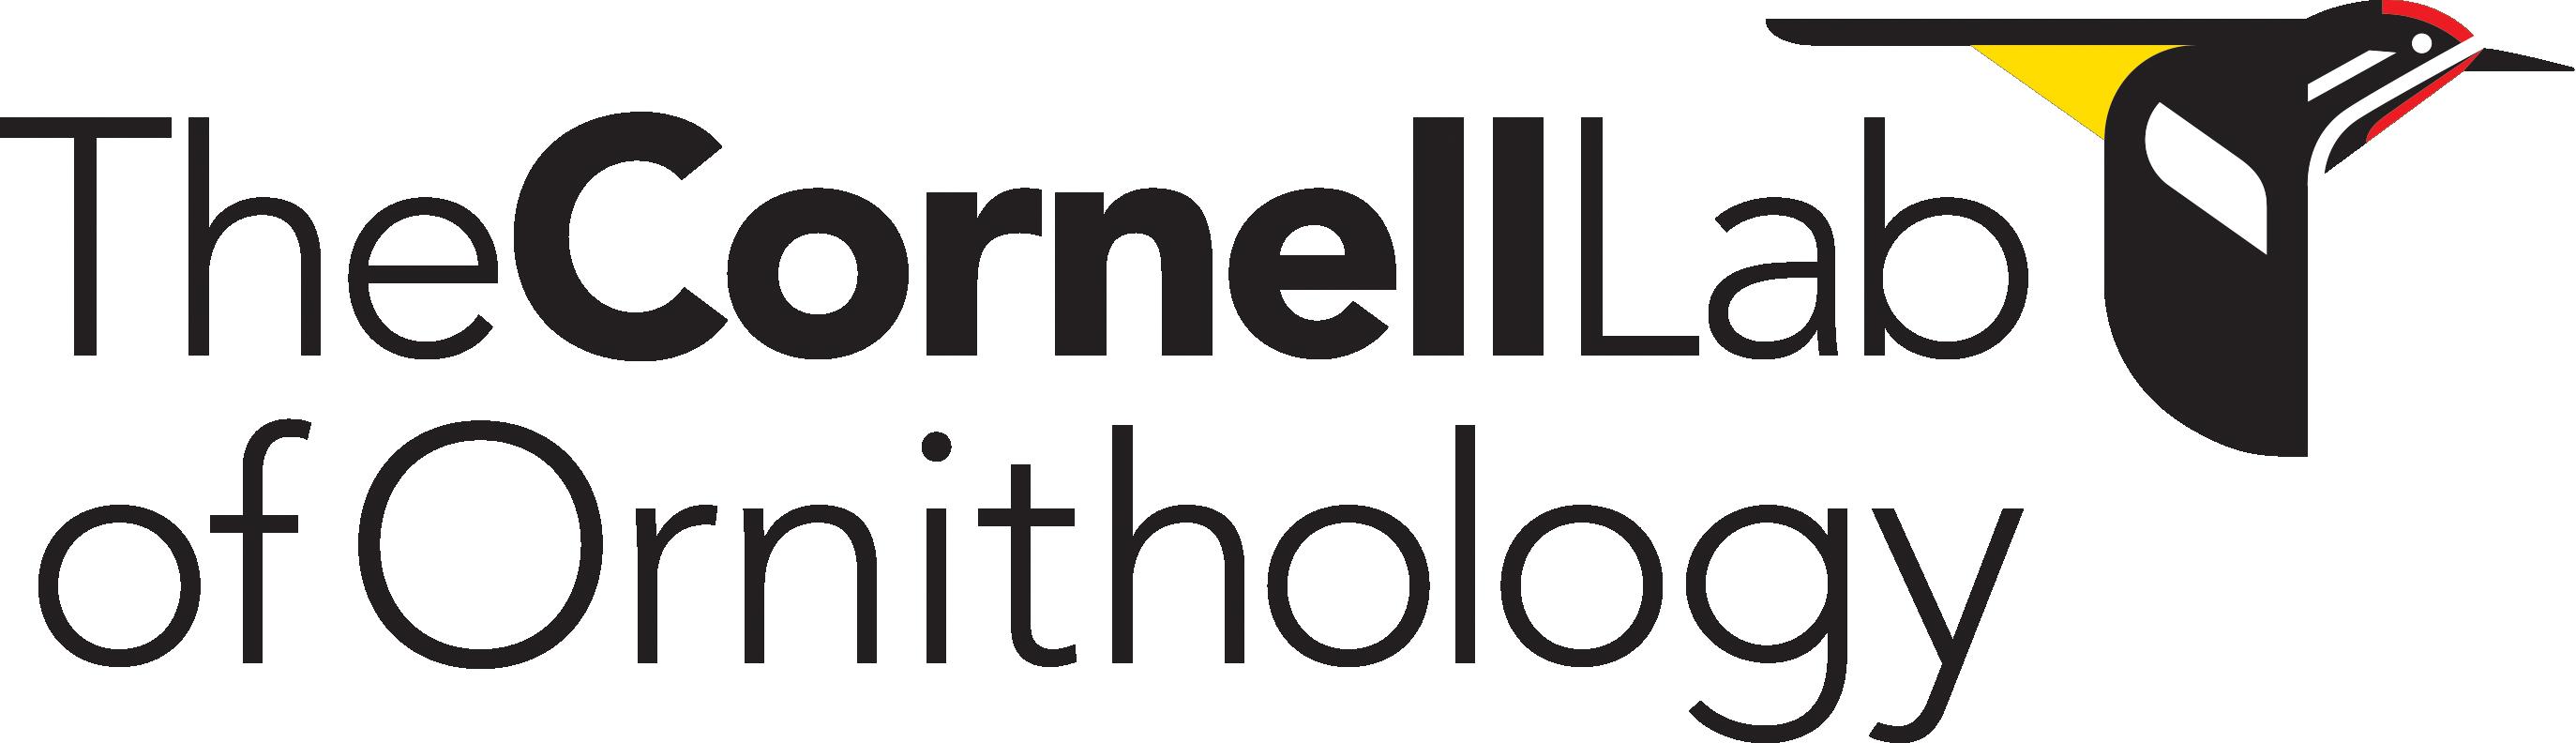 The Cornell Lab of Ornithology - Bird Cams Lab